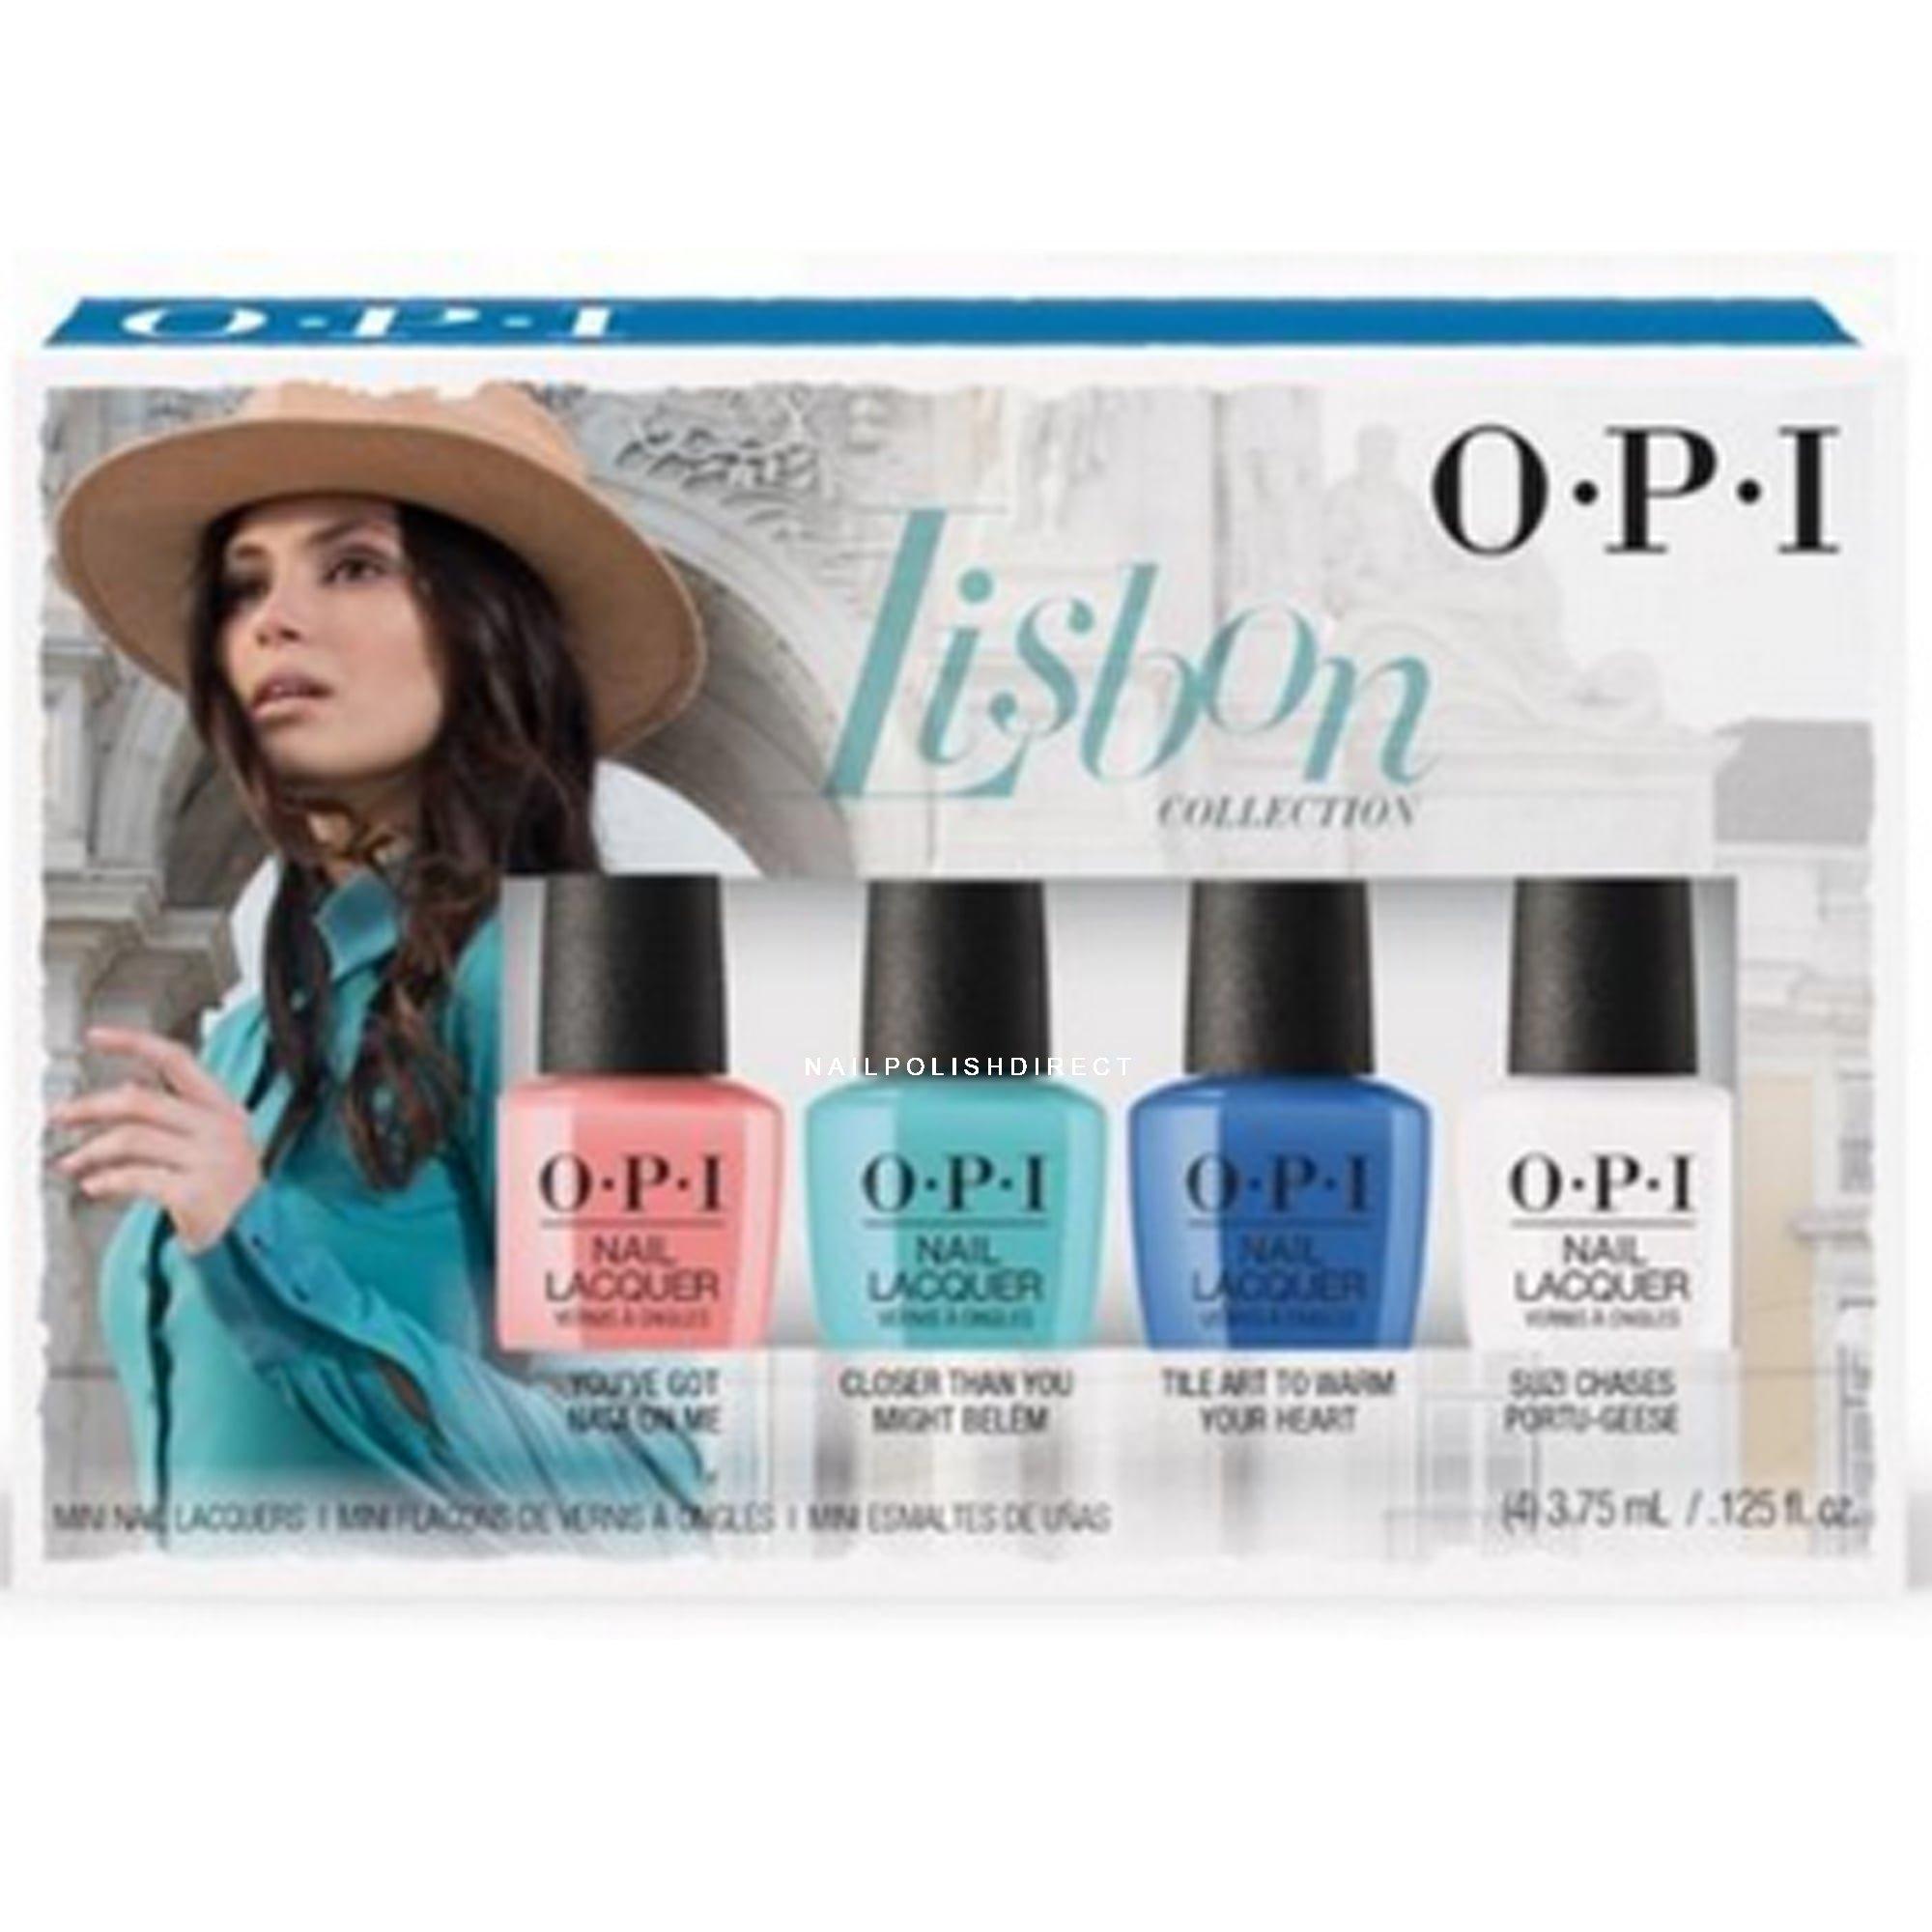 OPI Lisbon 2018 Nail Polish Collection - Mini Four Piece Set